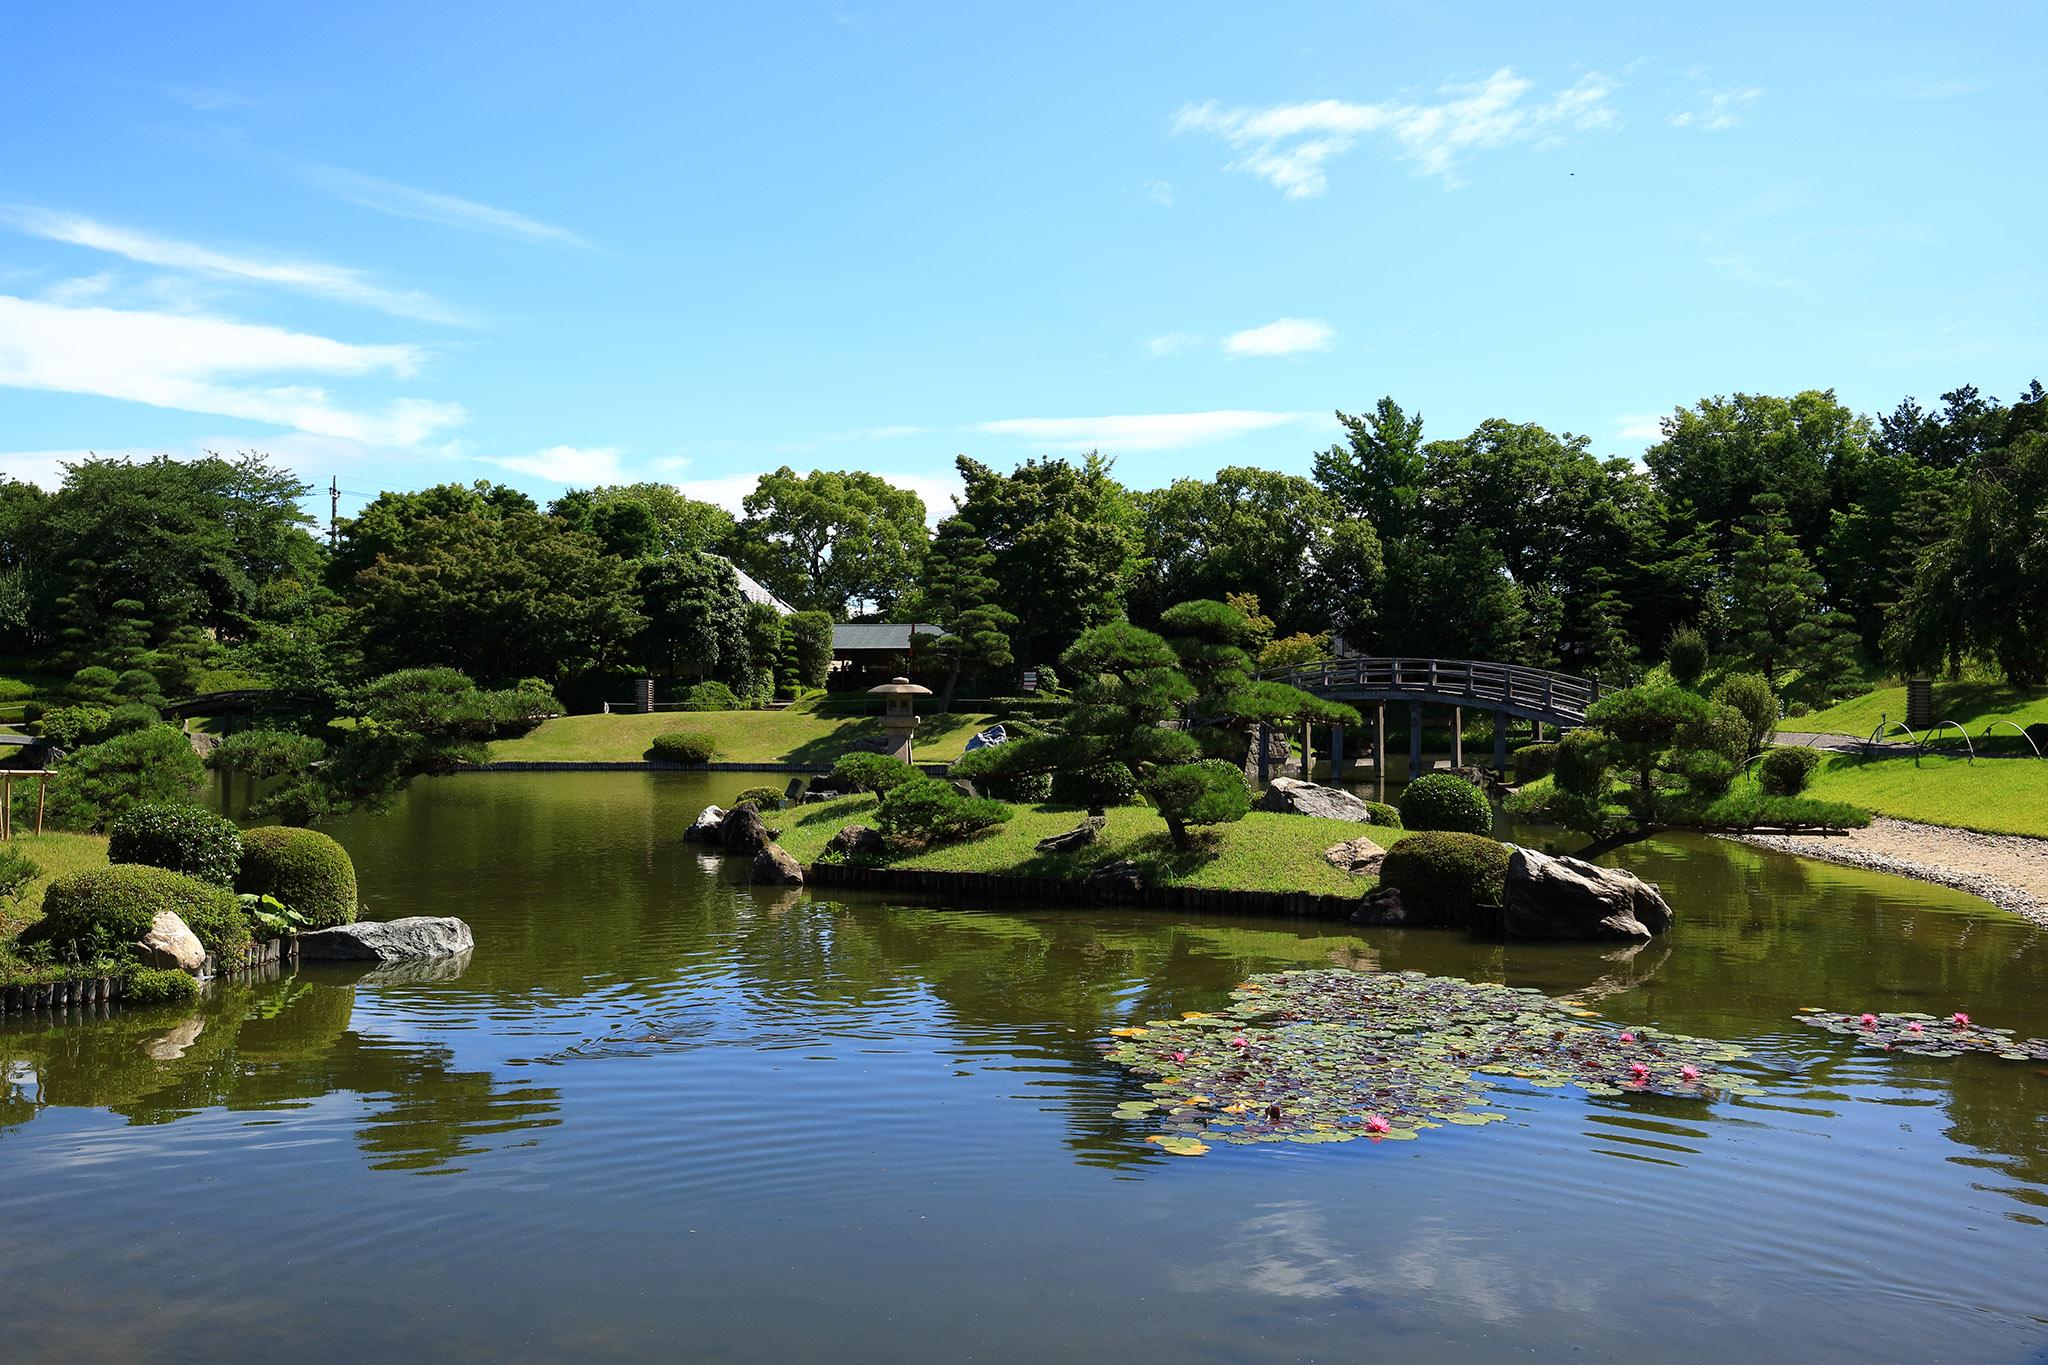 20150628_hanataen_chakai4_2048